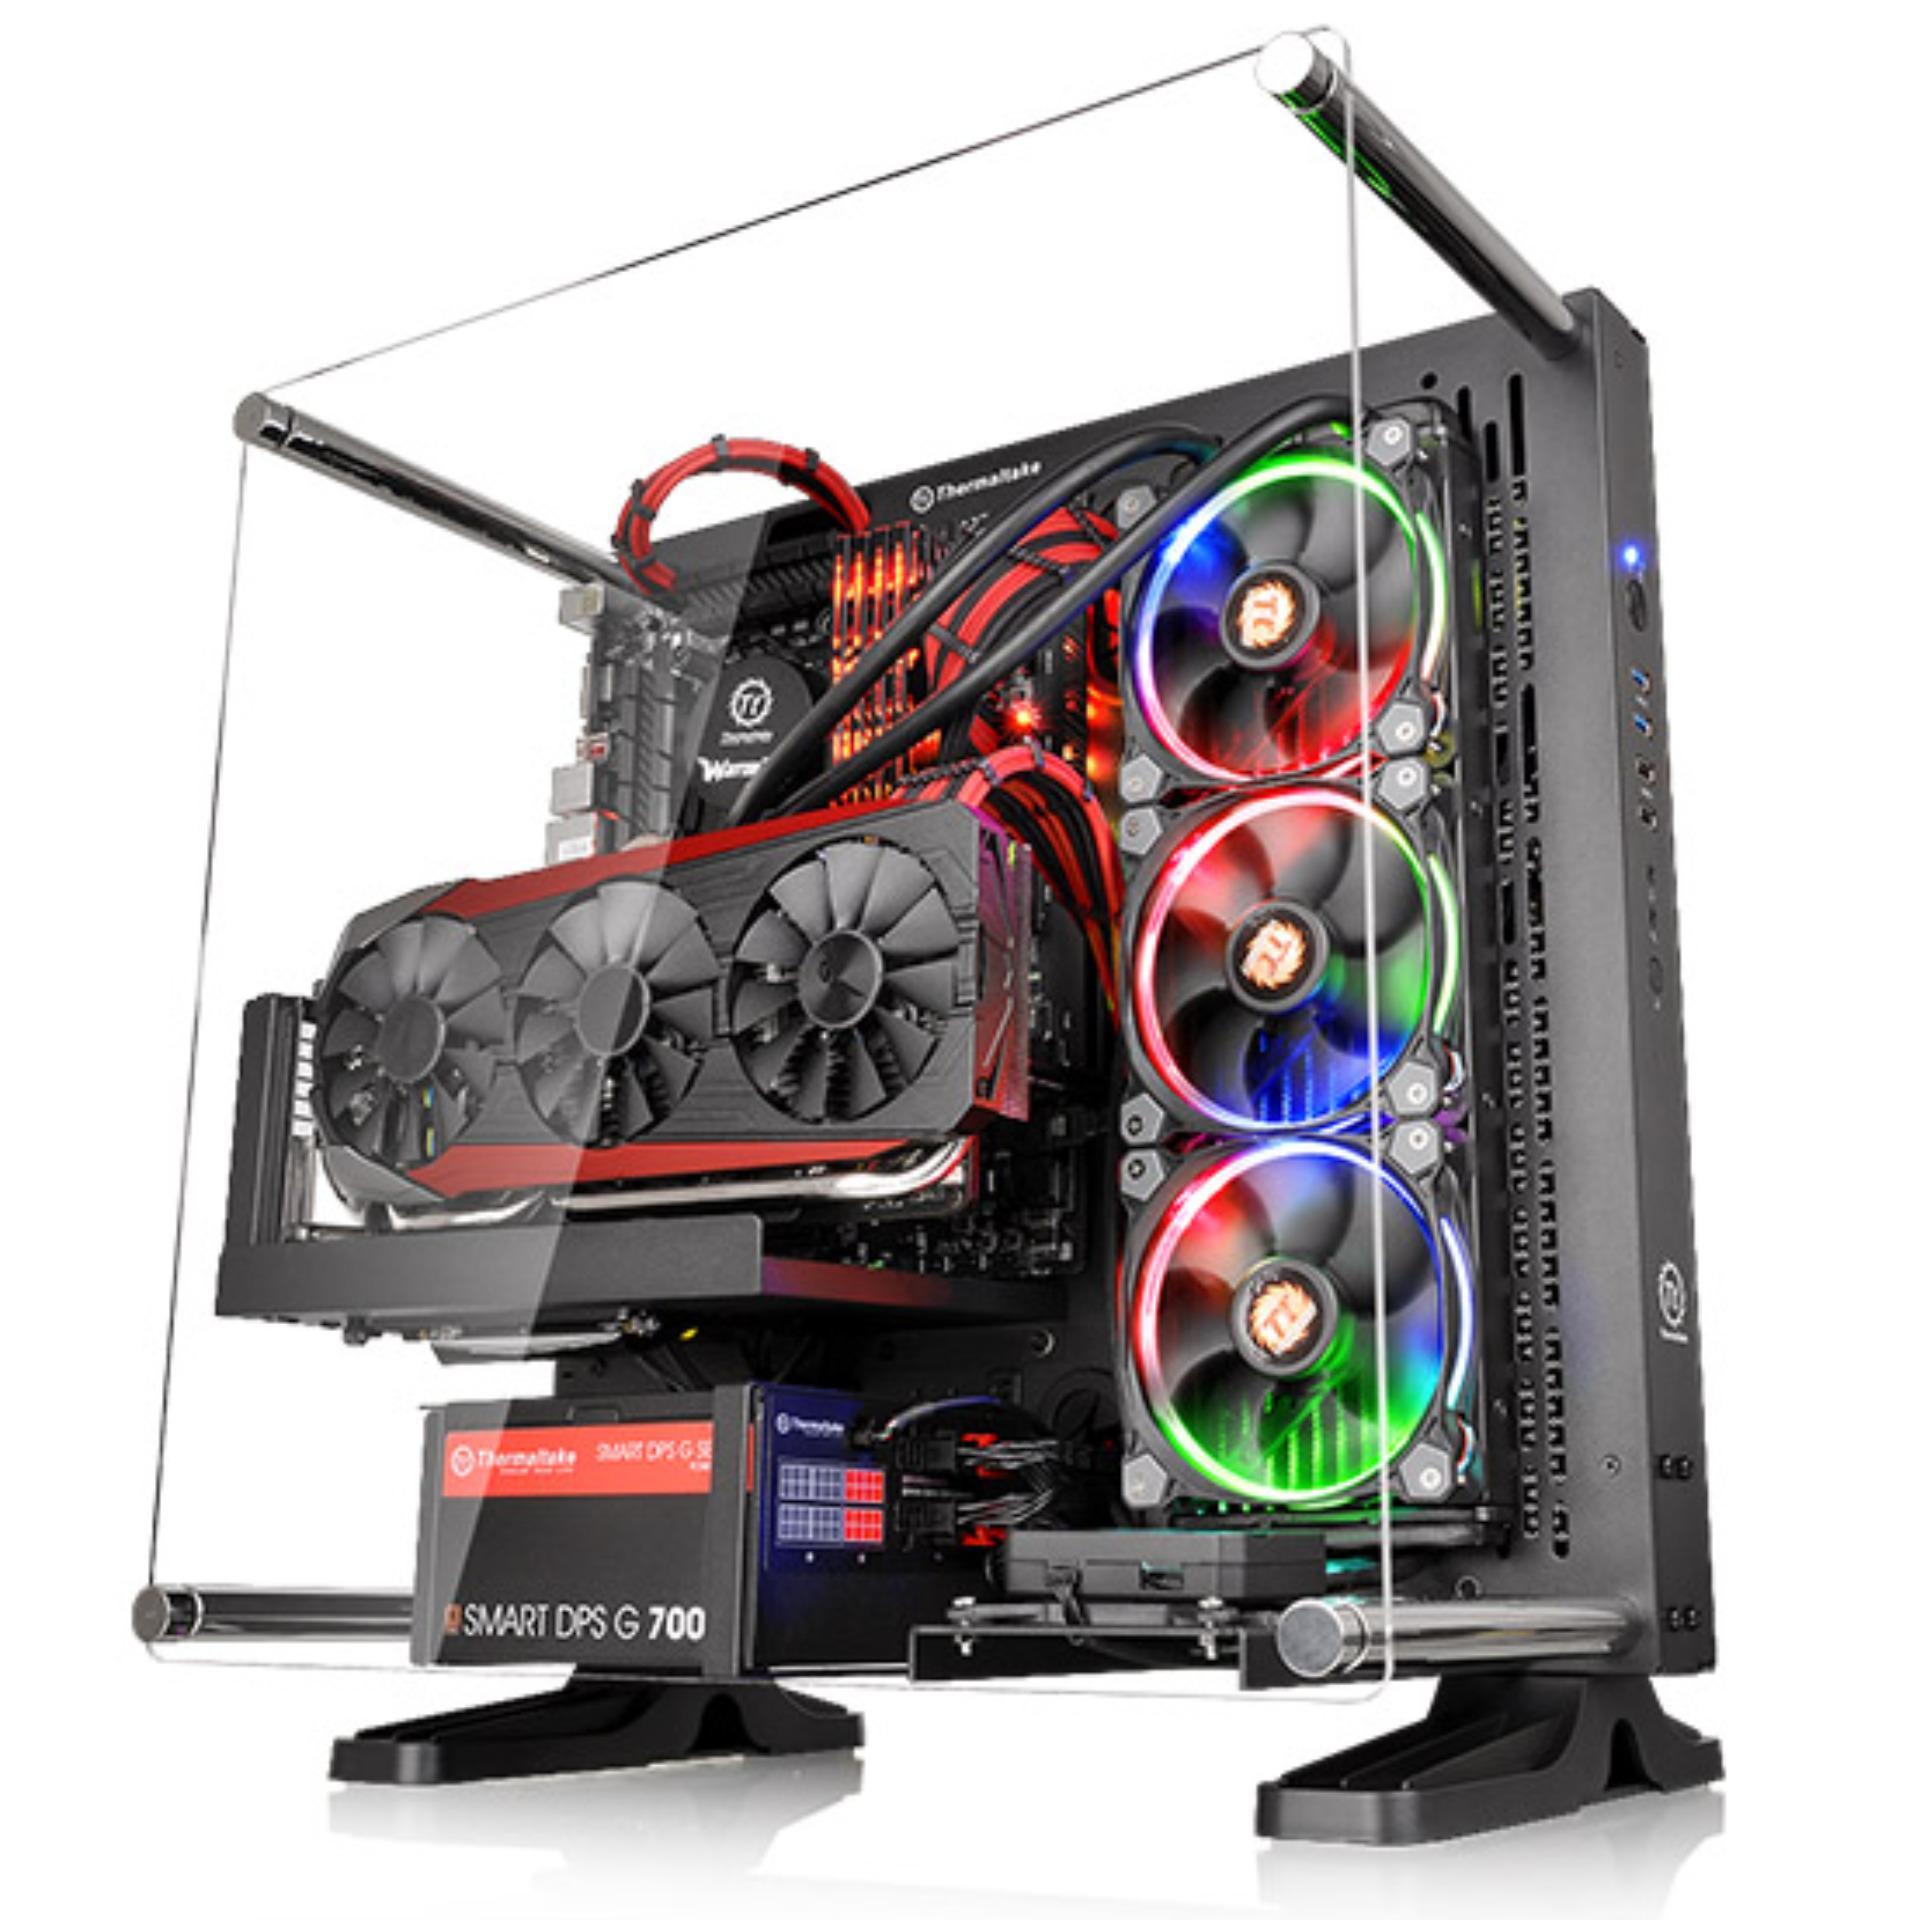 Thermaltake Core P3 ATX Open Frame Casing - Black Singapore